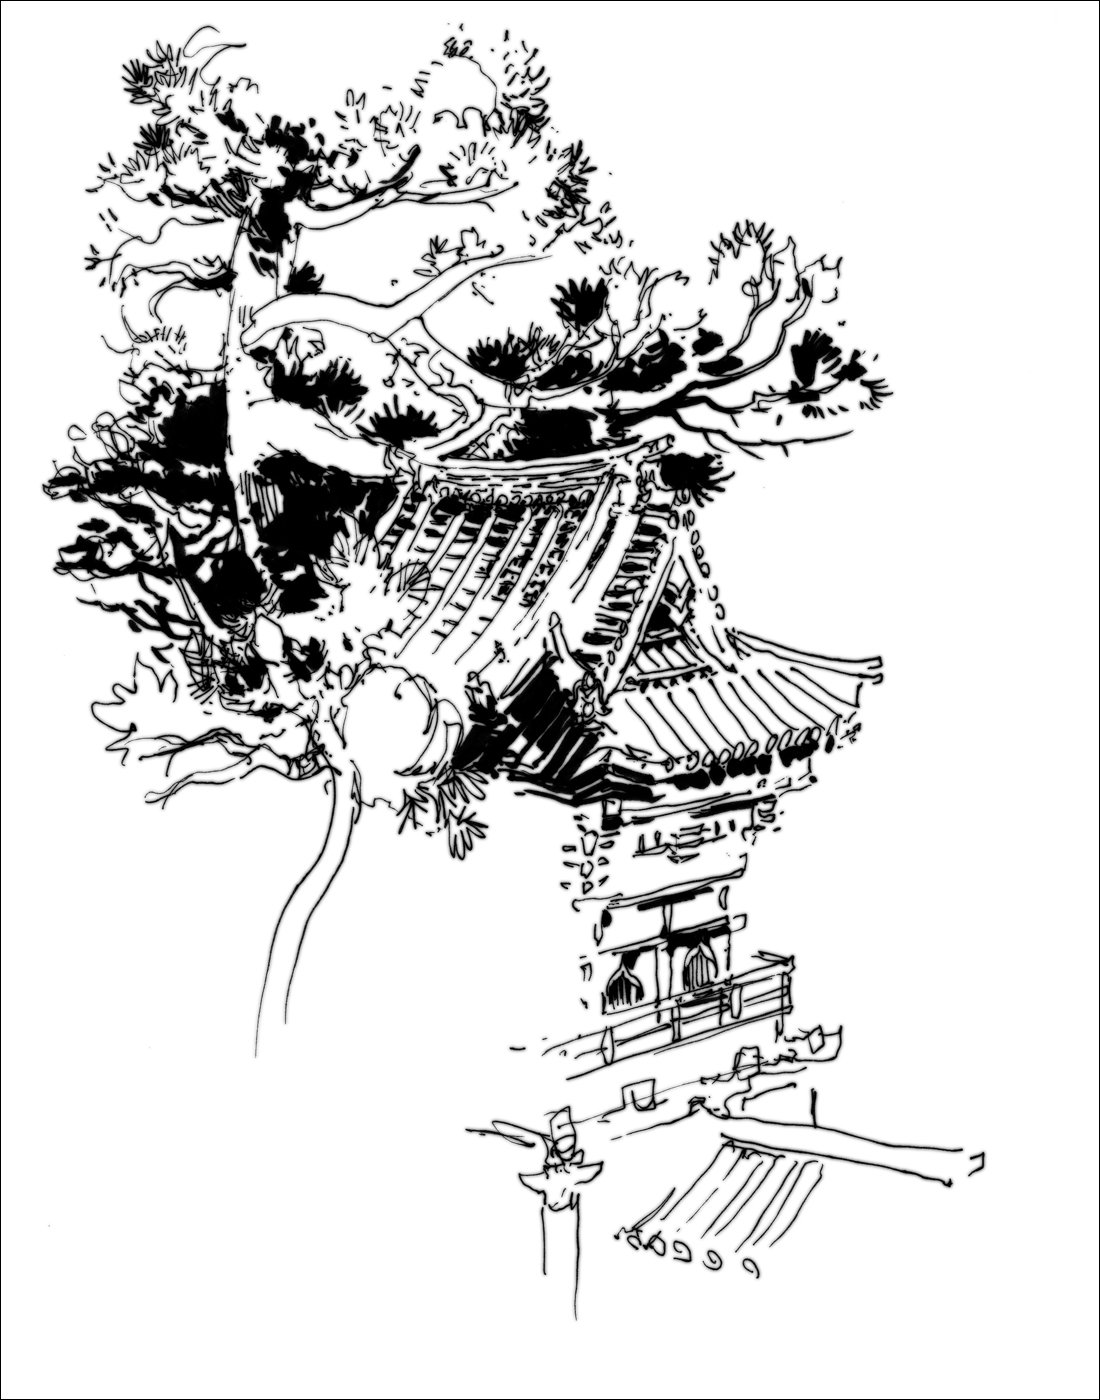 1100x1400 World Wide Sketchcrawl